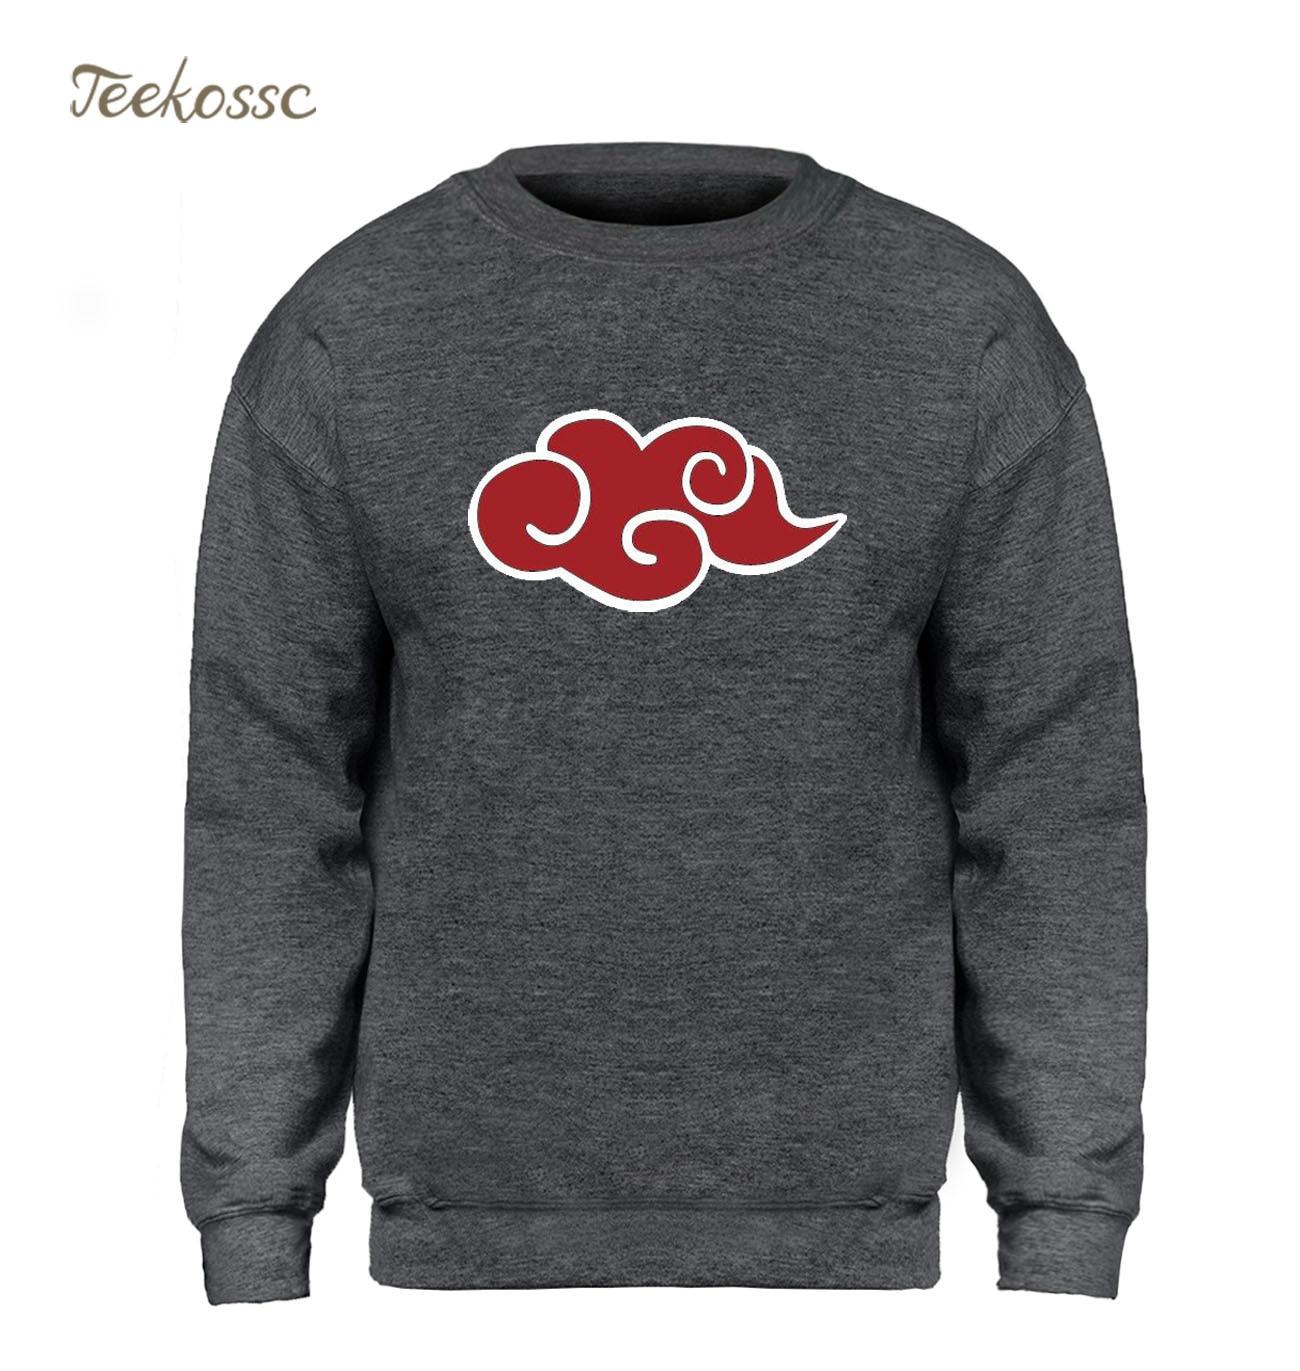 Naruto Akatsuki Hoodie Men Japan Anime Red Cloud Sweatshirt 2018 Winter Autumn Fleece Warm Slim Sweatshirts Mens Brand Clothing